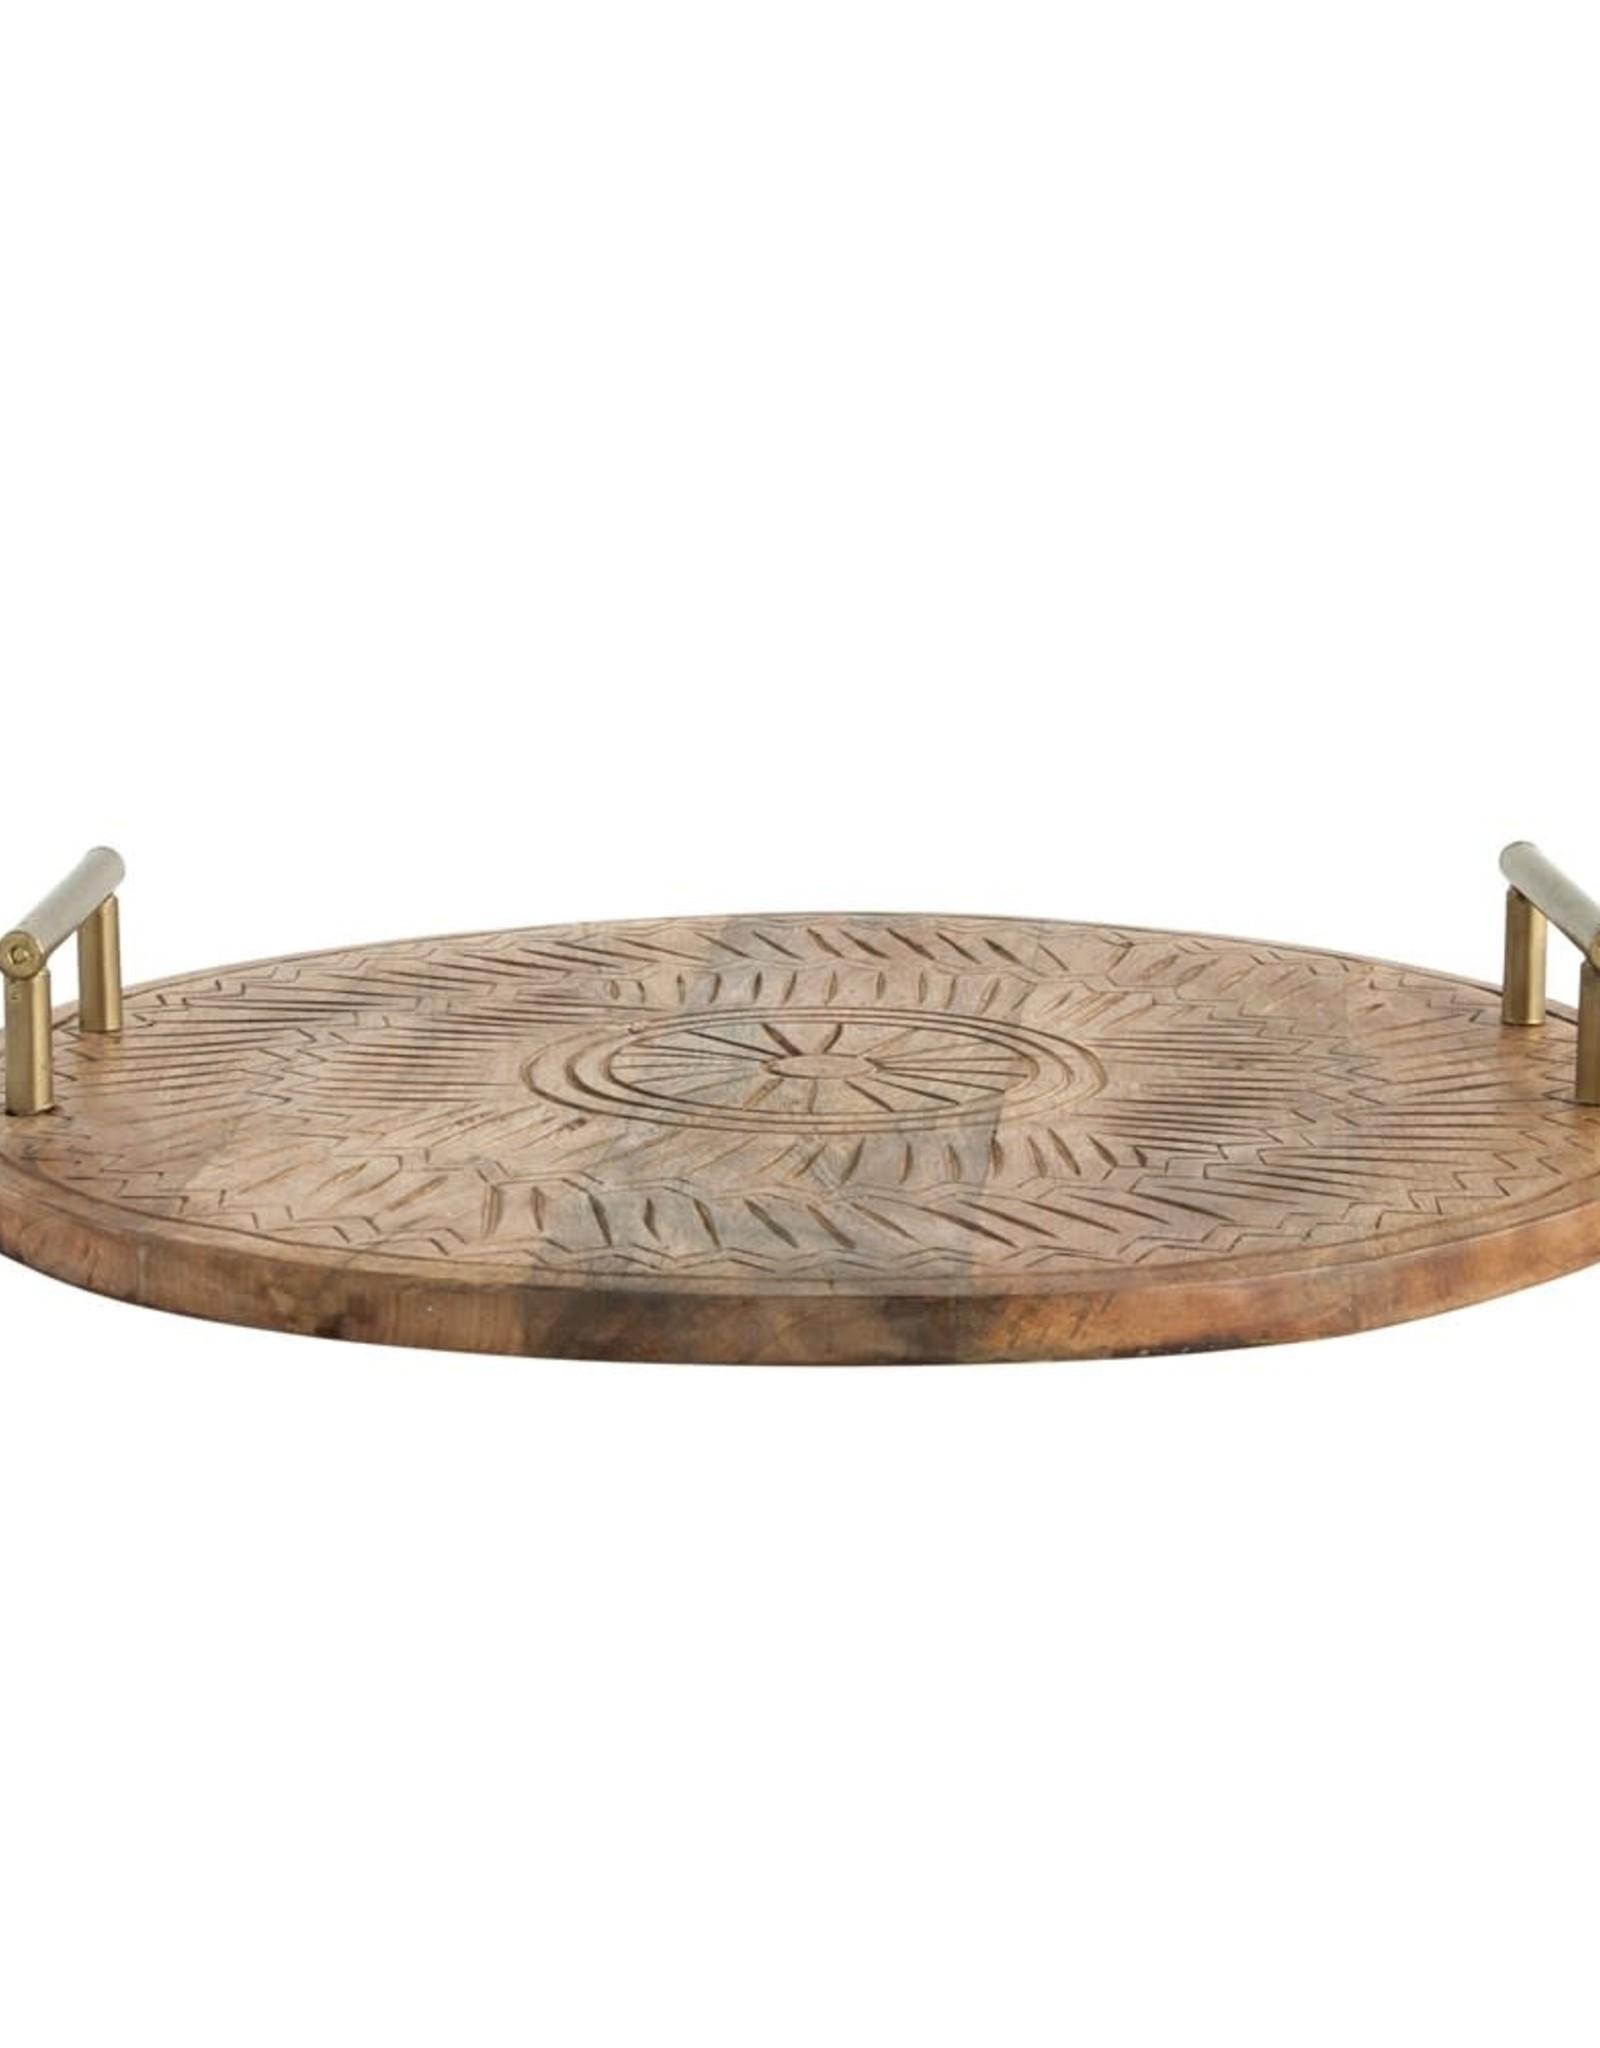 "20"" x 3""H Round Hand-Carved Mango Wood Tray w/ Metal Handles"